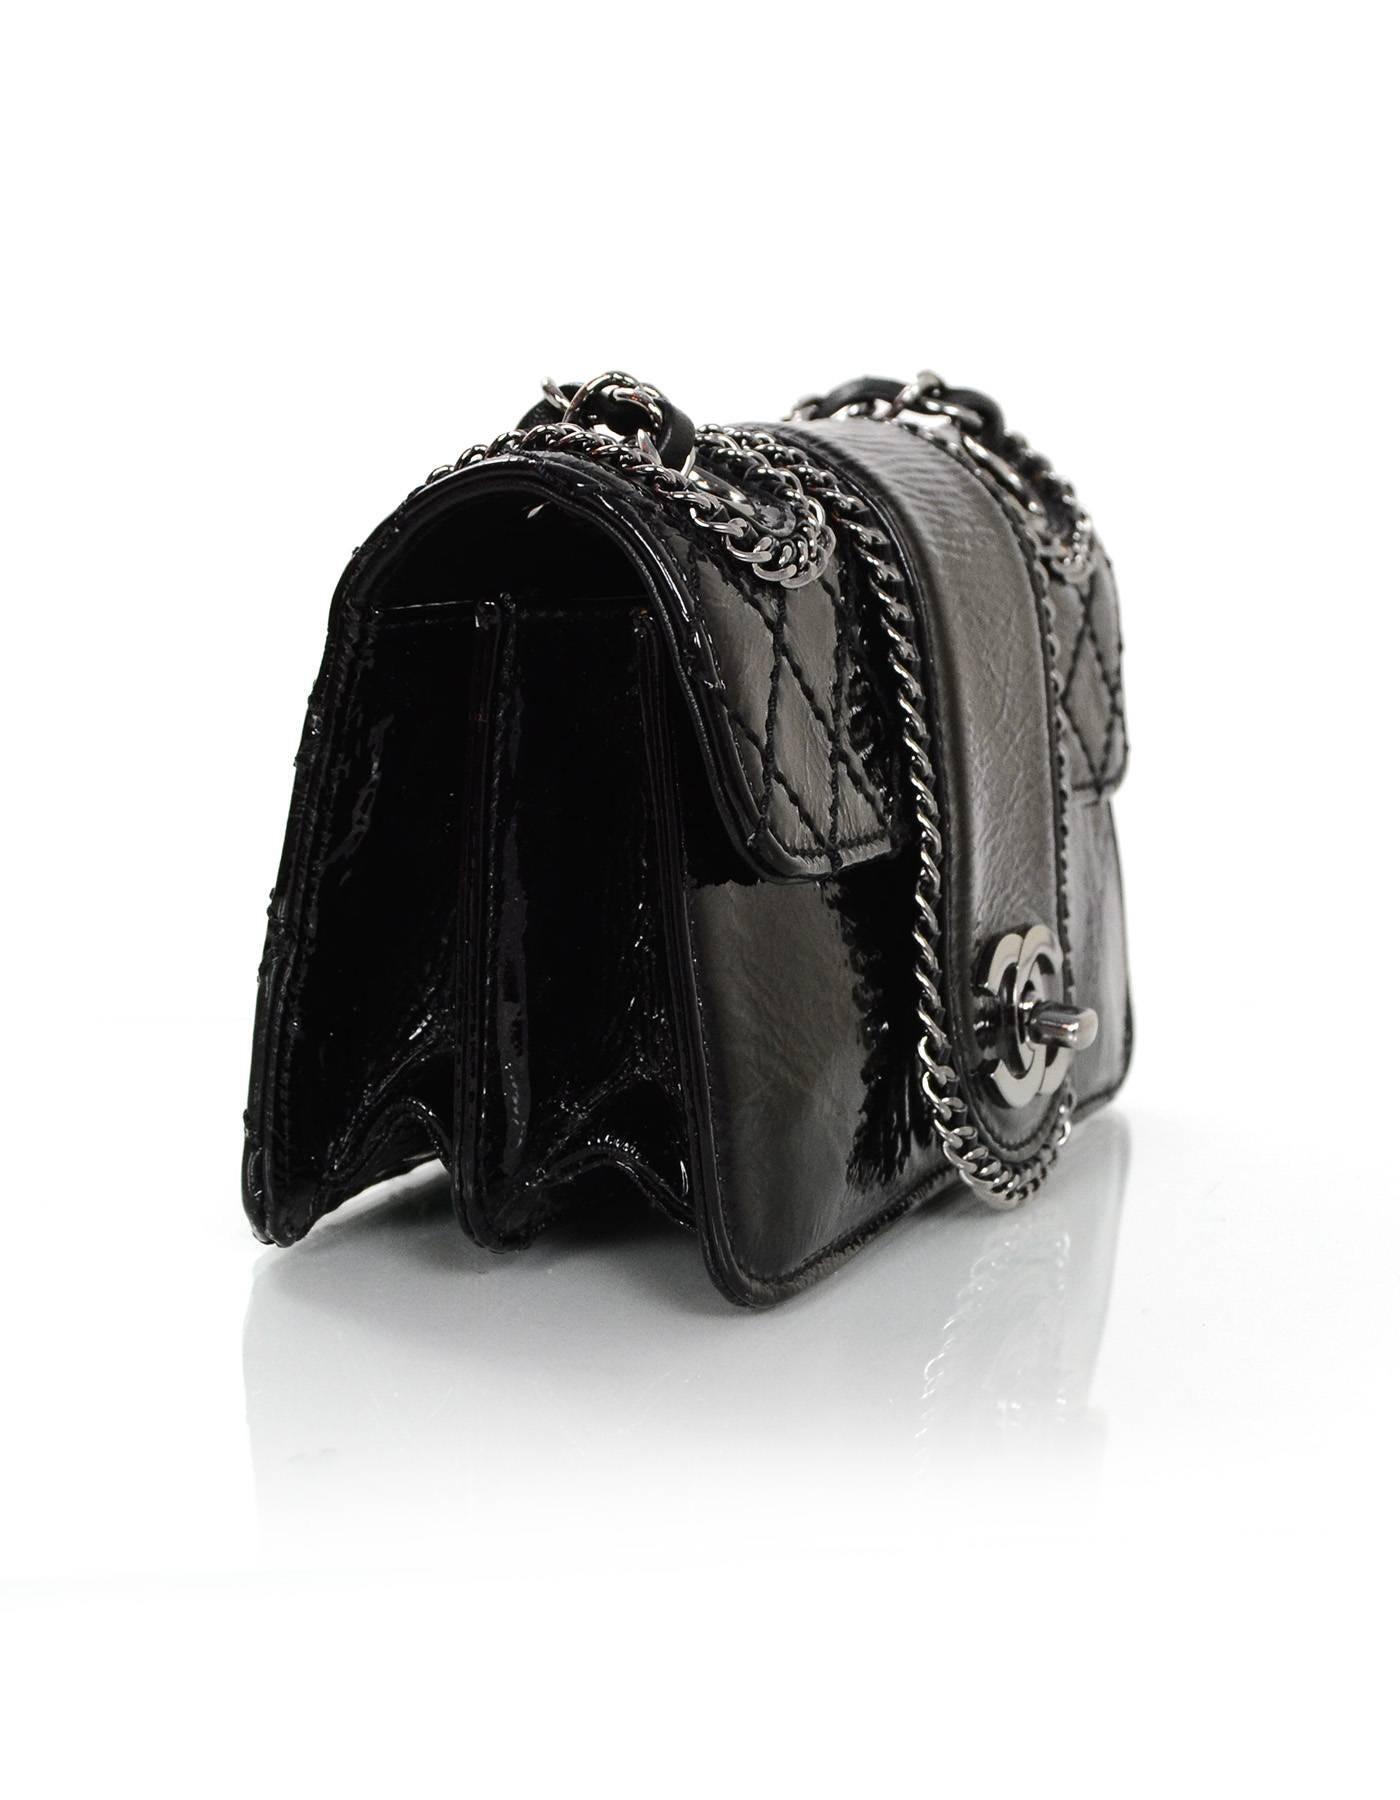 aaa74b24b94a59 Chanel Black Patent Mini Madison Flap Bag For Sale at 1stdibs